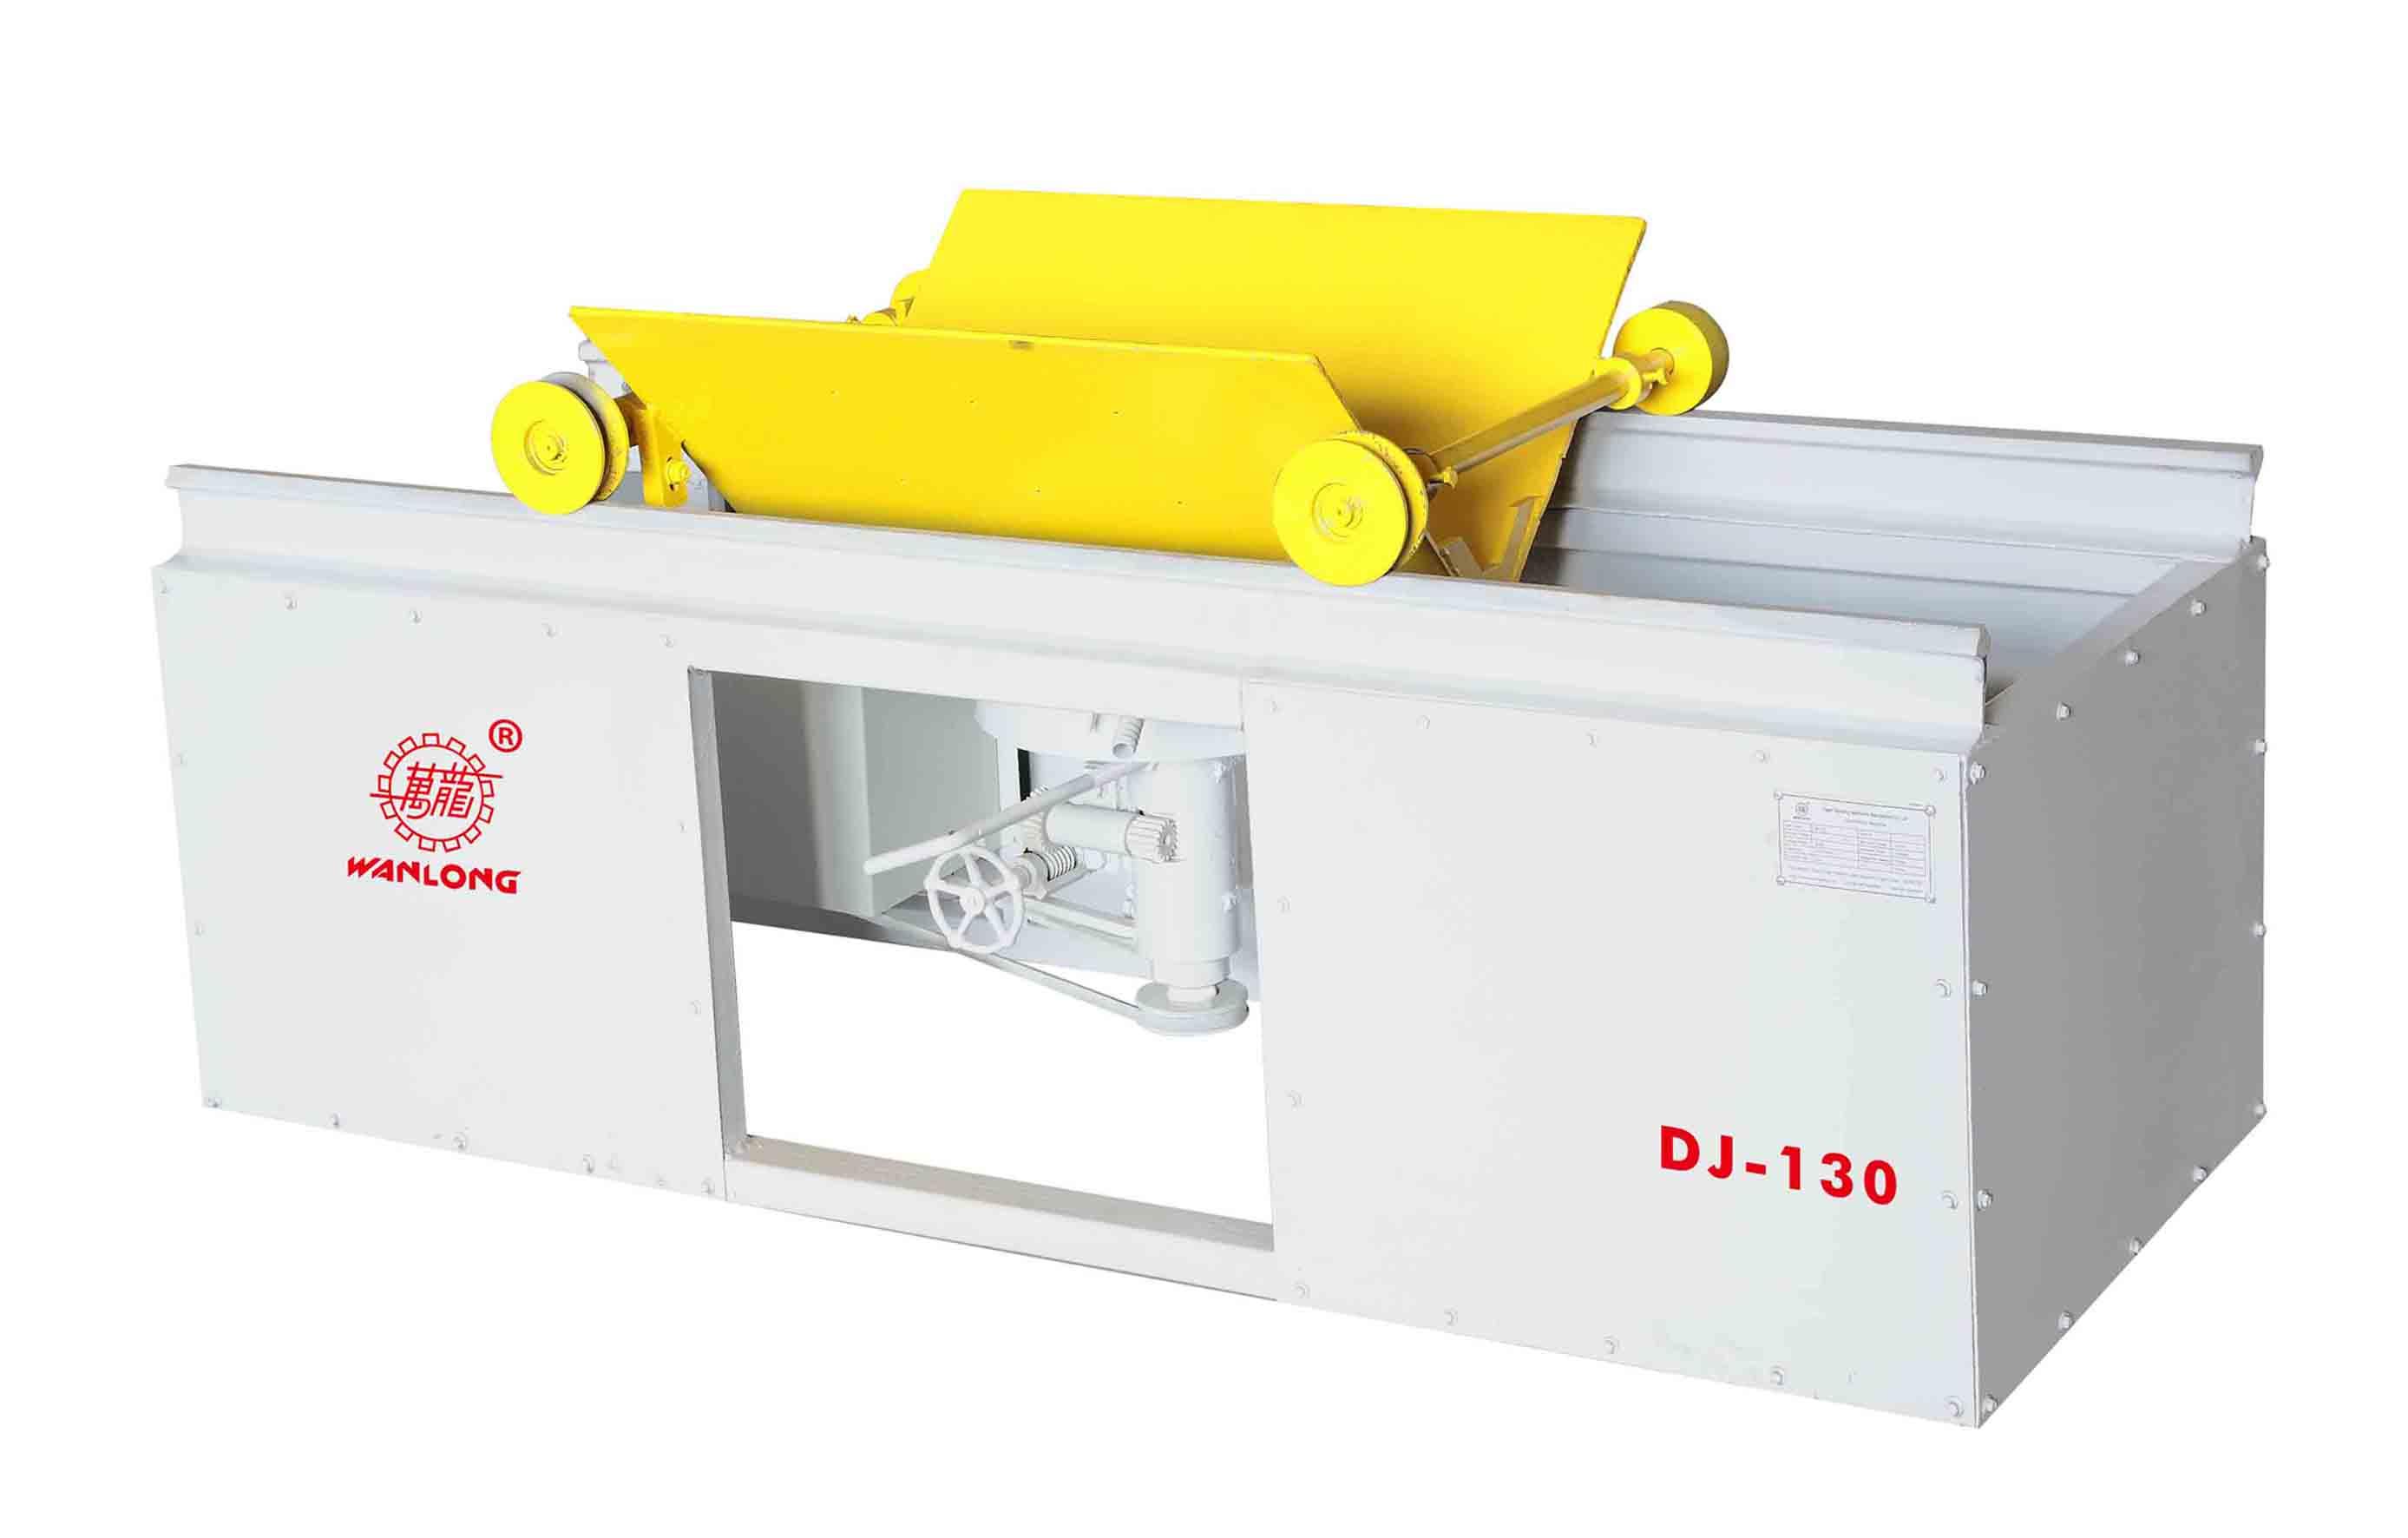 DJ-130 Chamfering Machine